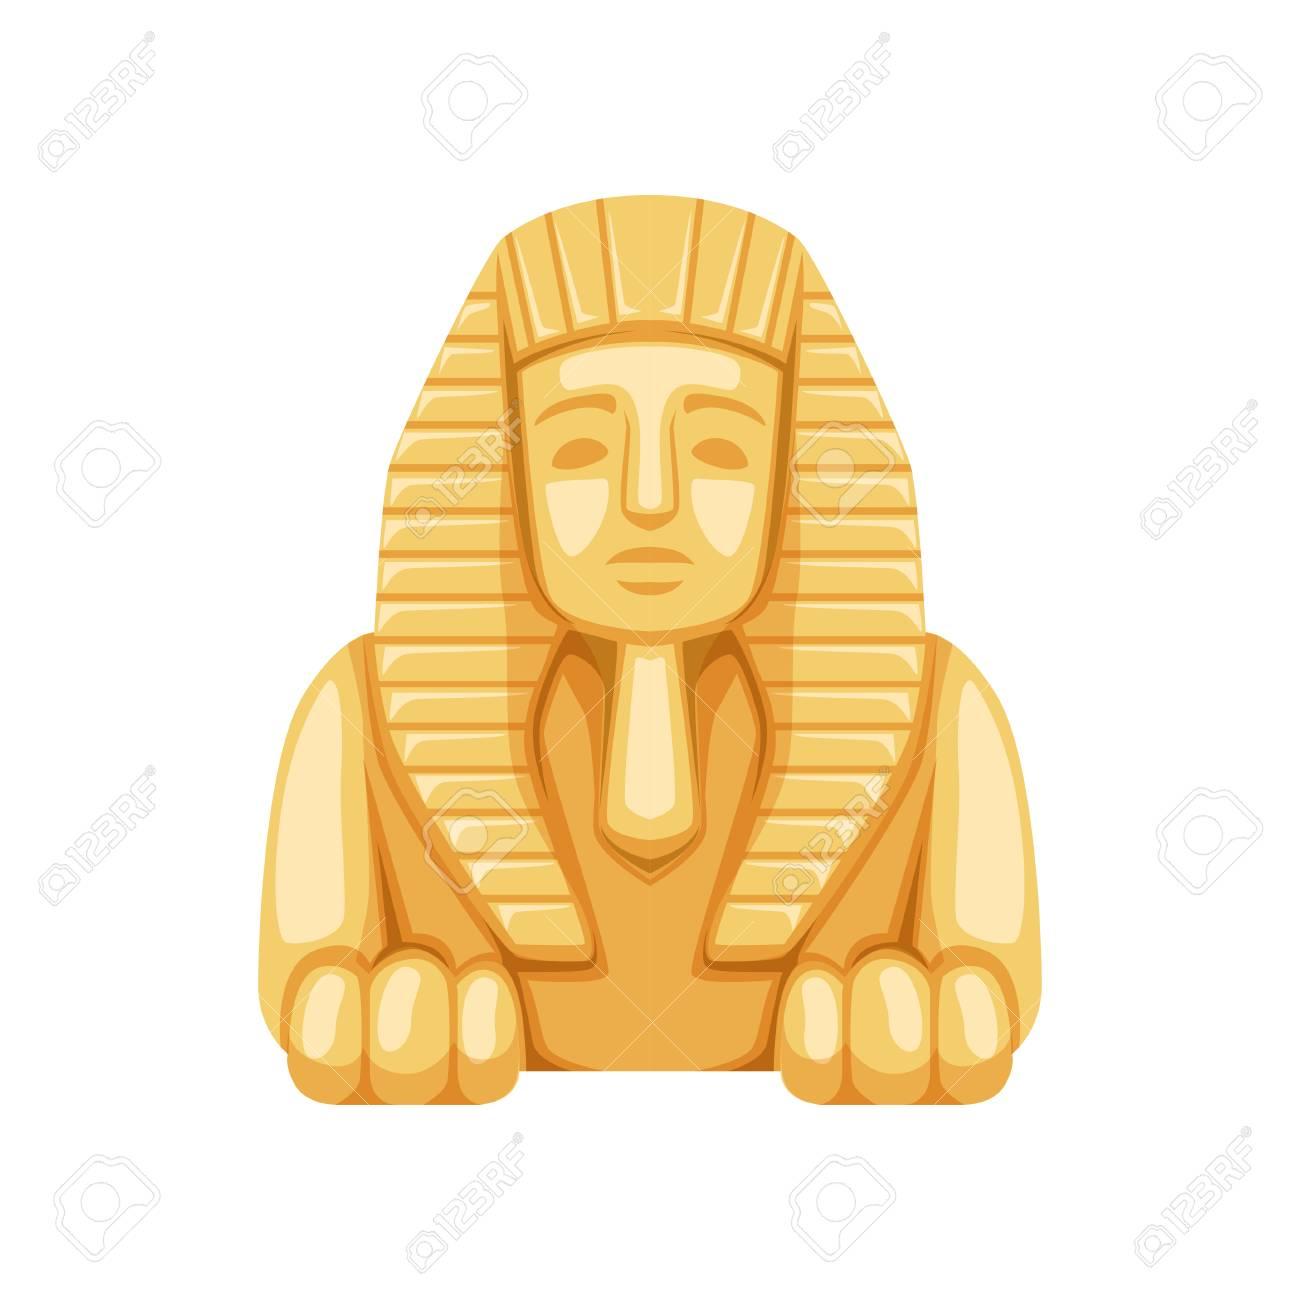 Egyptian Sphinx statue, symbol of ancient Egypt Illustration. - 91385589